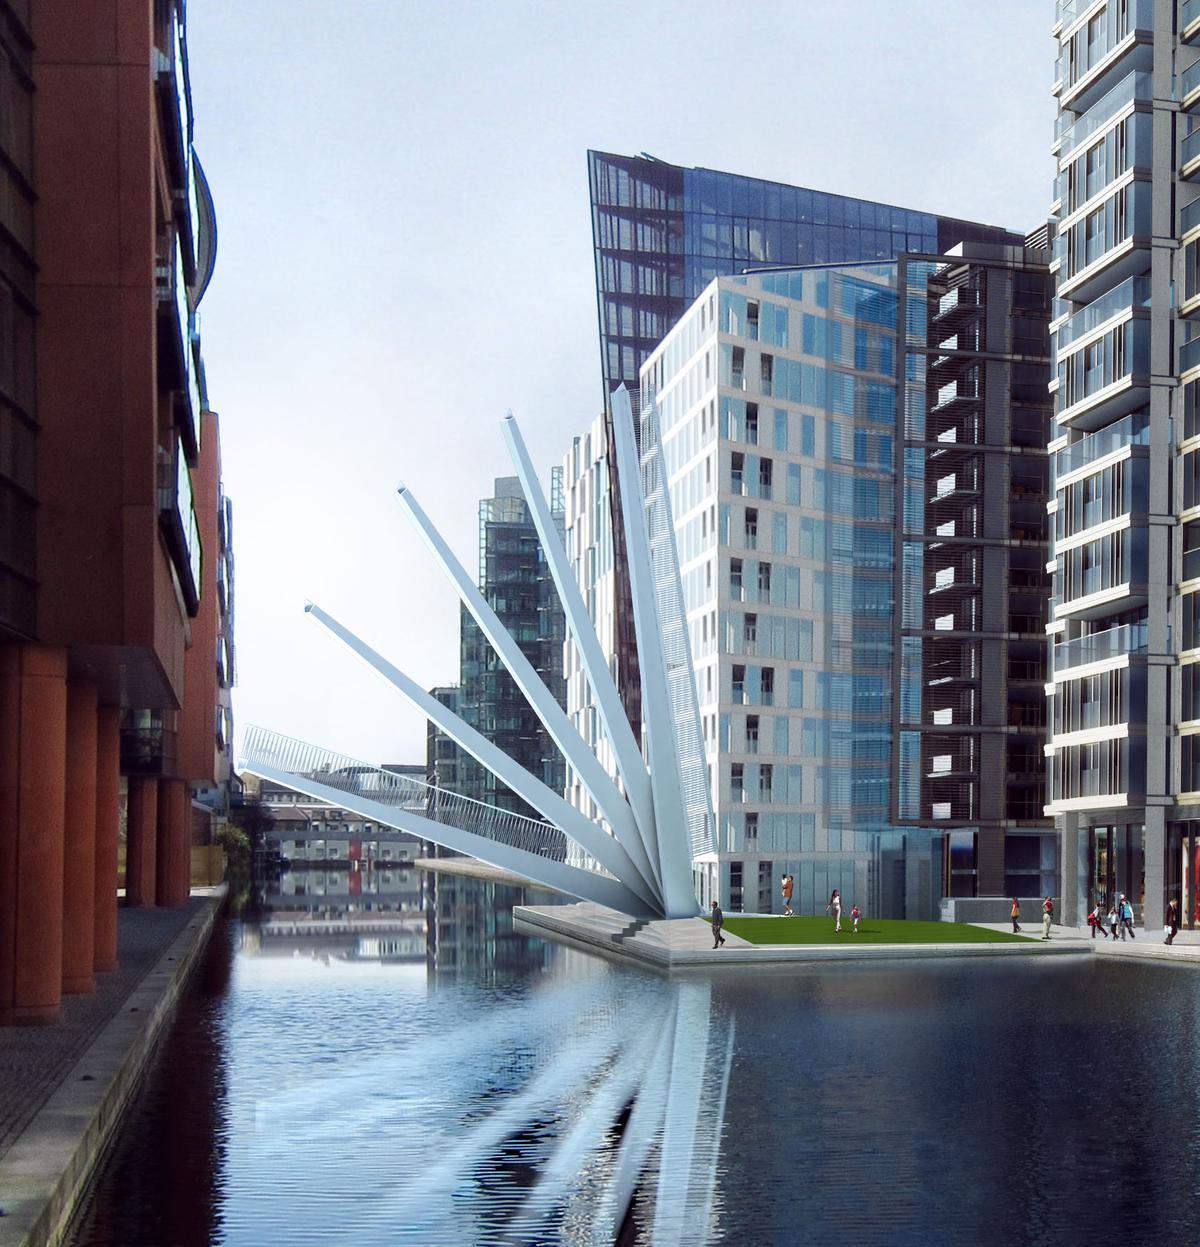 Knight Architects' Merchant Square Bridge raises like a traditional Japanese fan (Image: Knight Architects)